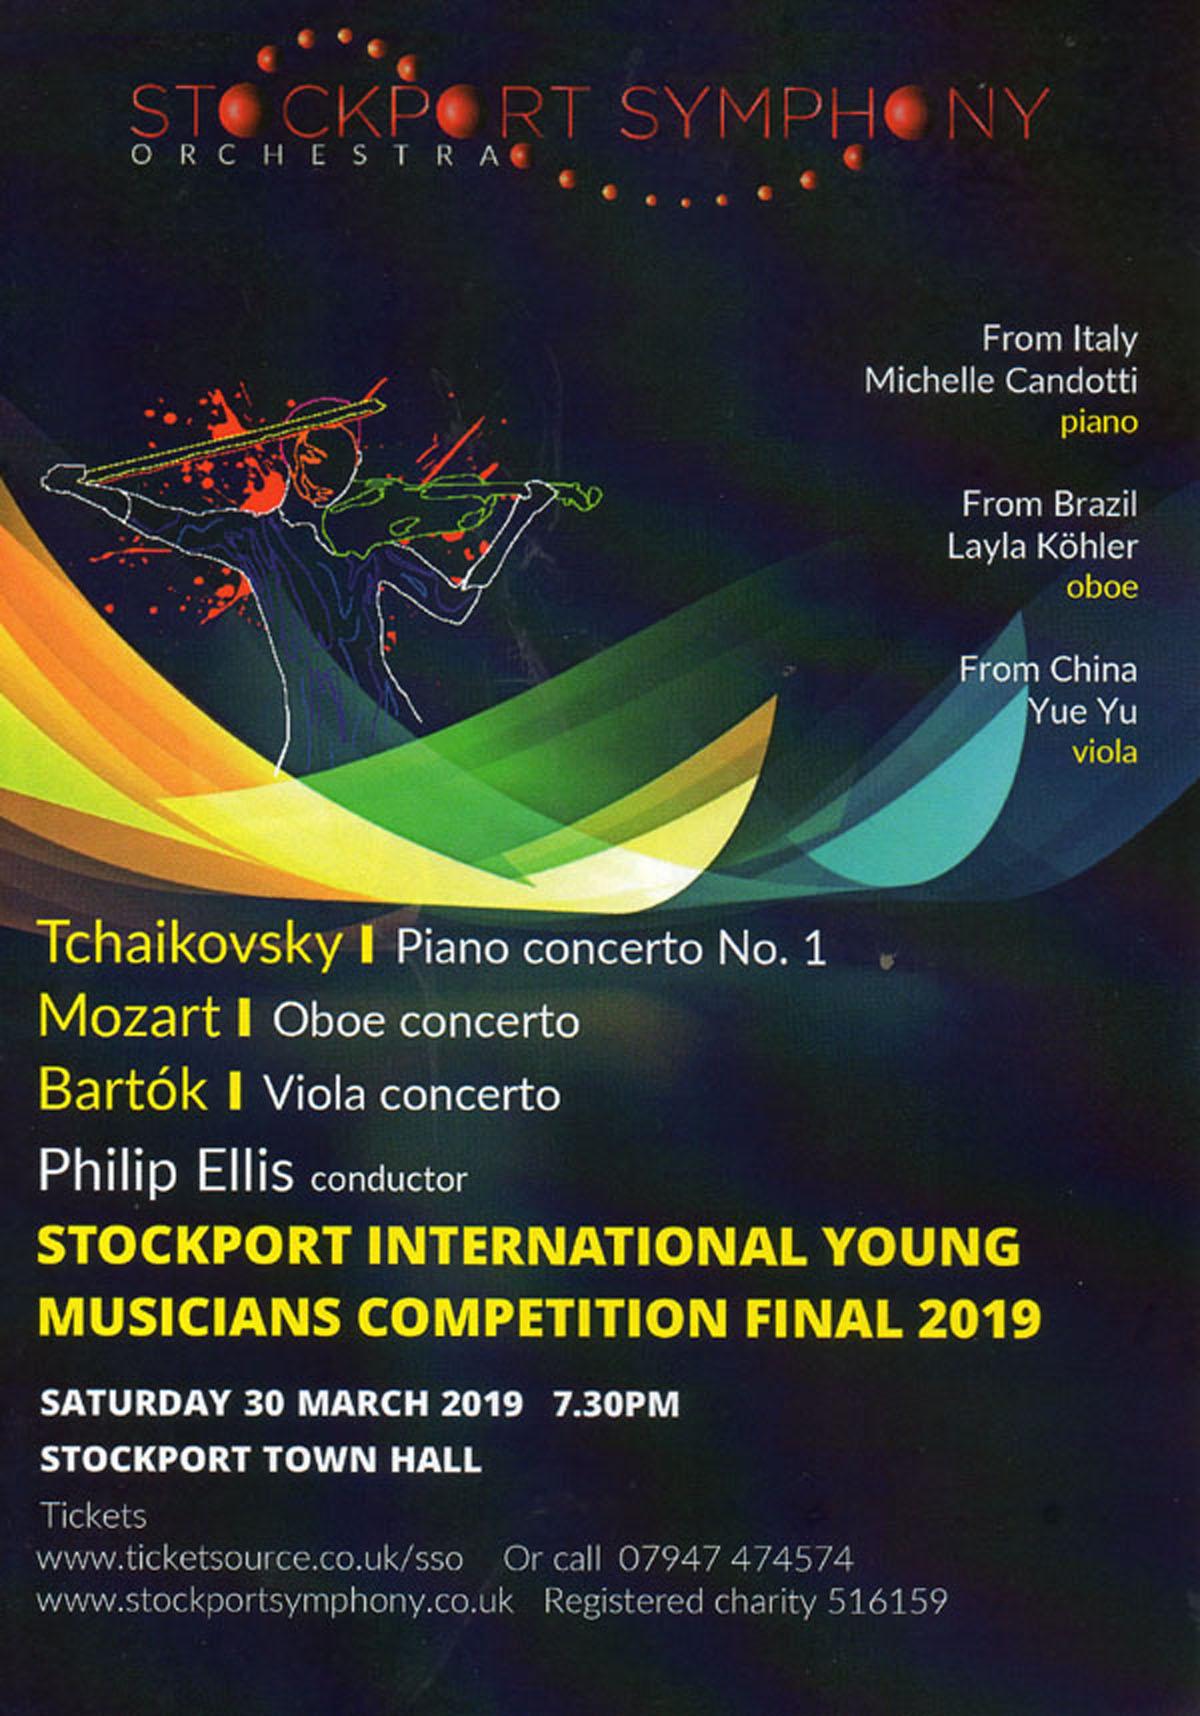 Stockport Symphony Orchestra - Stockport International Young